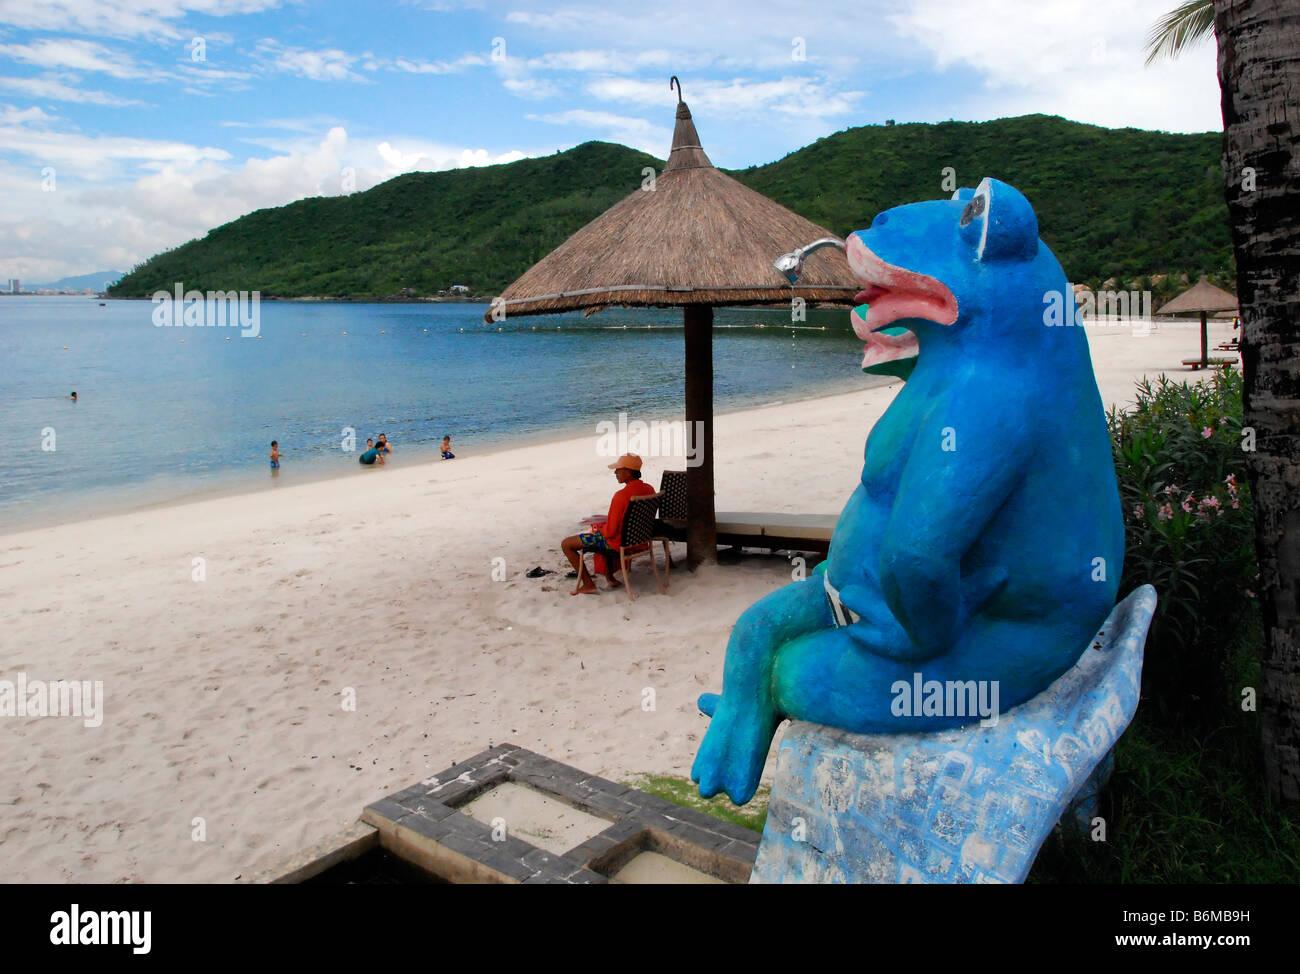 Giant Flog and beach, Water slide, Vin Pearl Amusement Park, Nha Trang, Vietnam - Stock Image